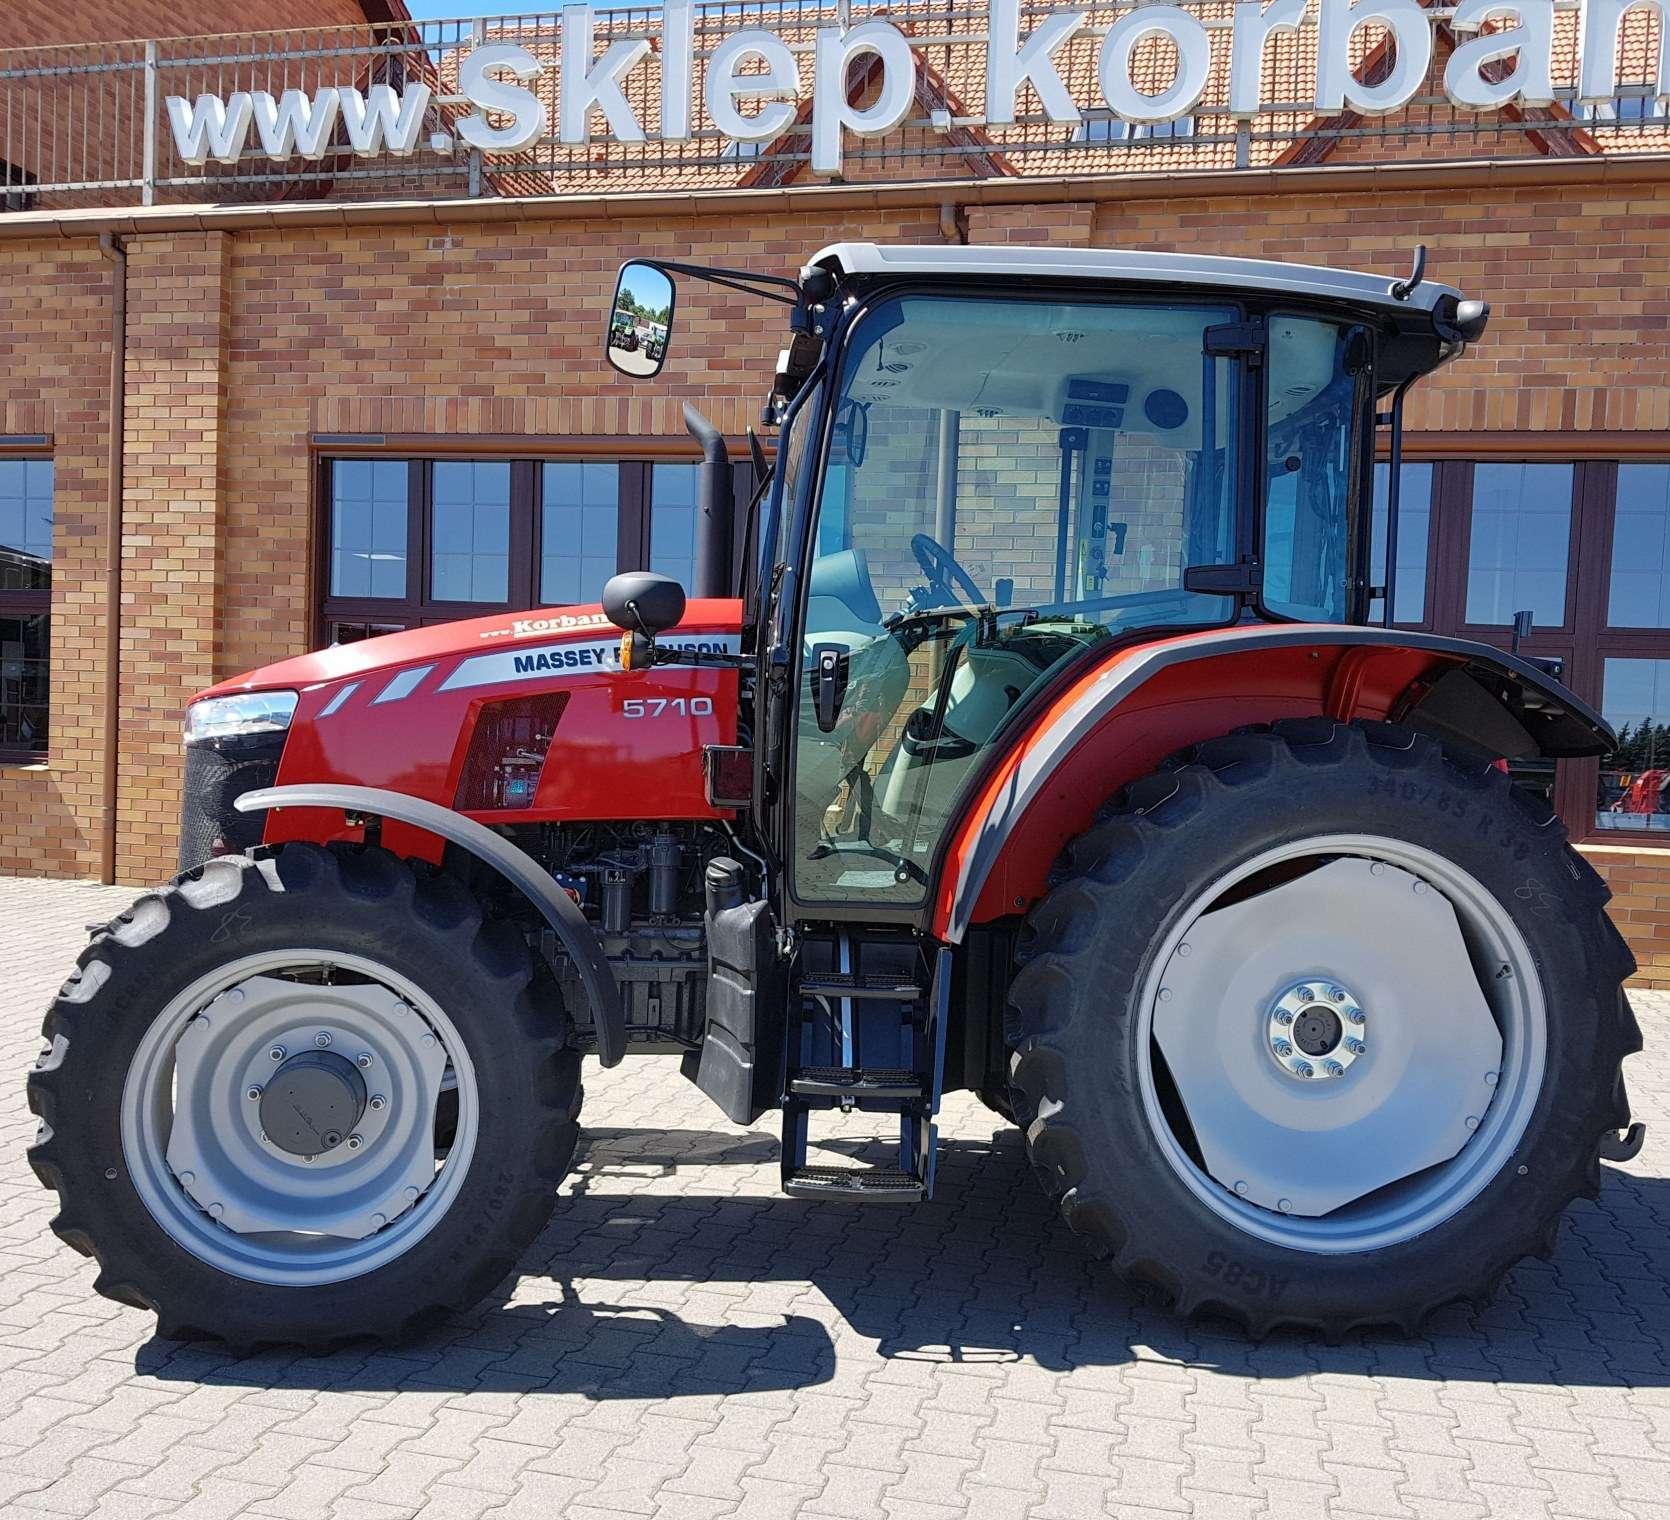 oferta strony korbanek.pl Massey Ferguson 5710 silnik 4,4 litry nowy traktor